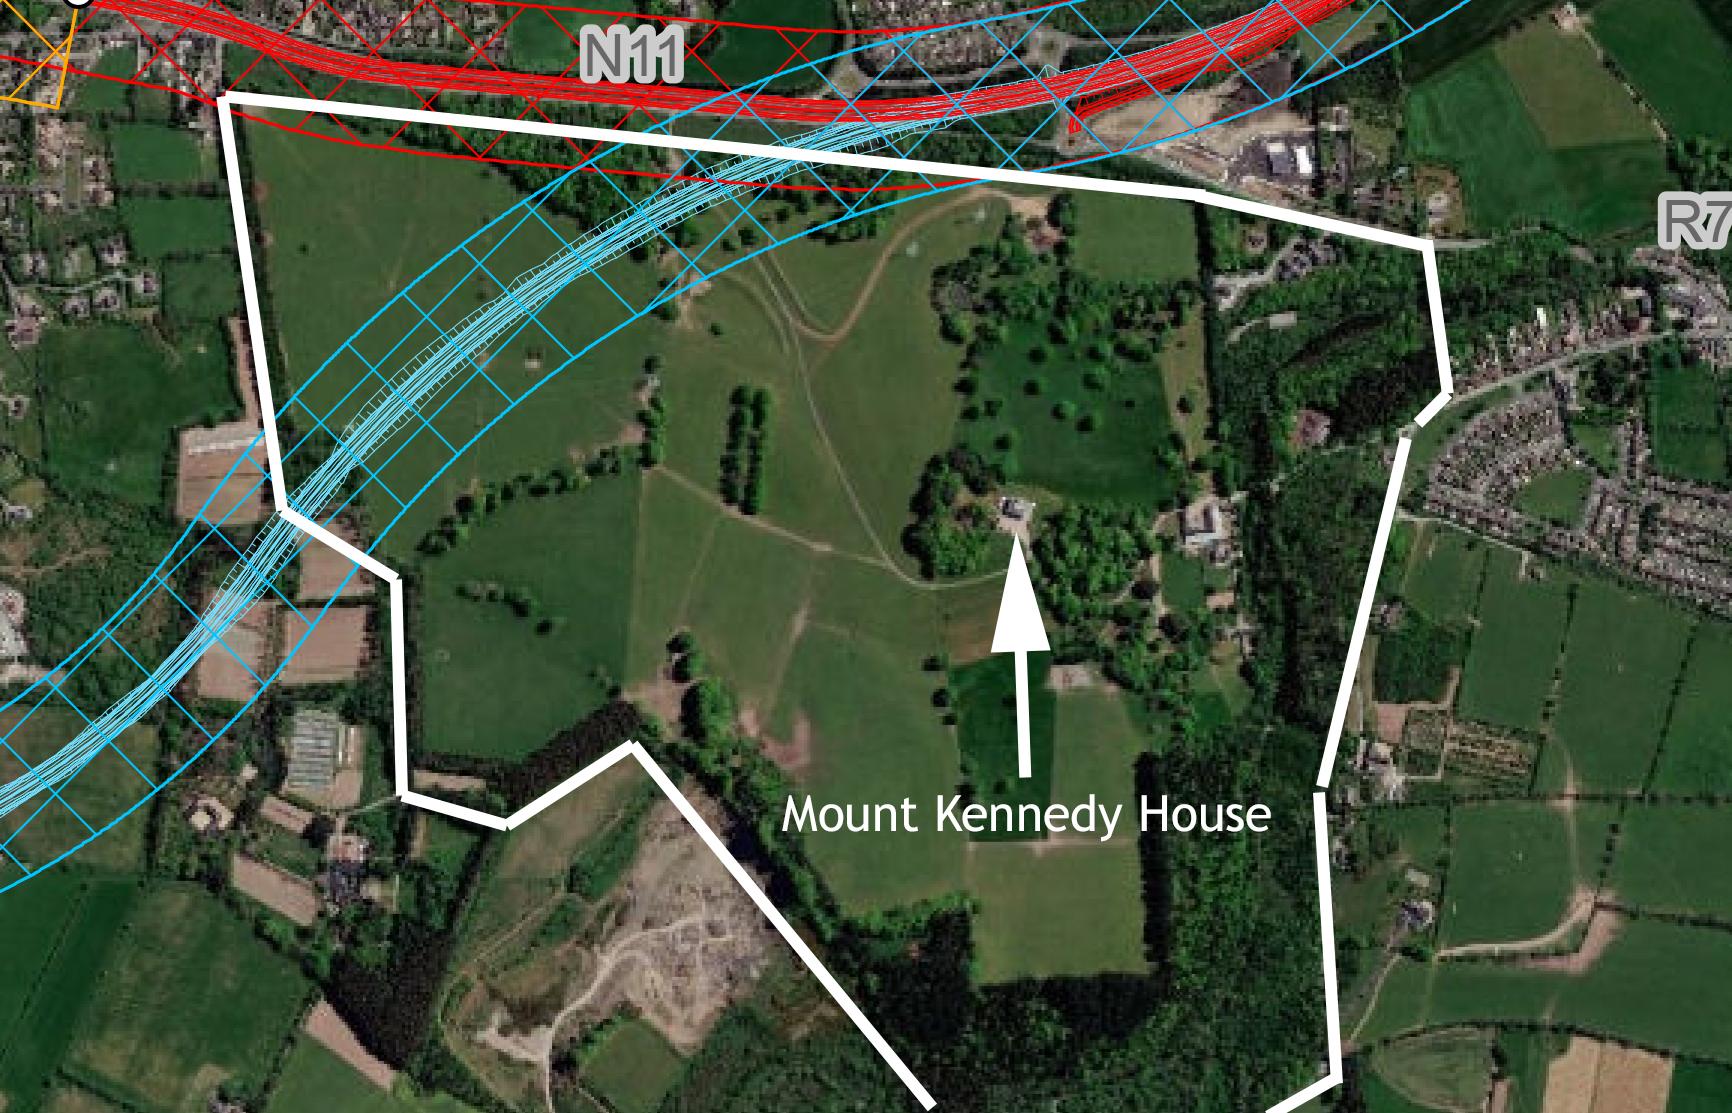 12.-Mount-Kennedy-House-location.jpg#asset:13080